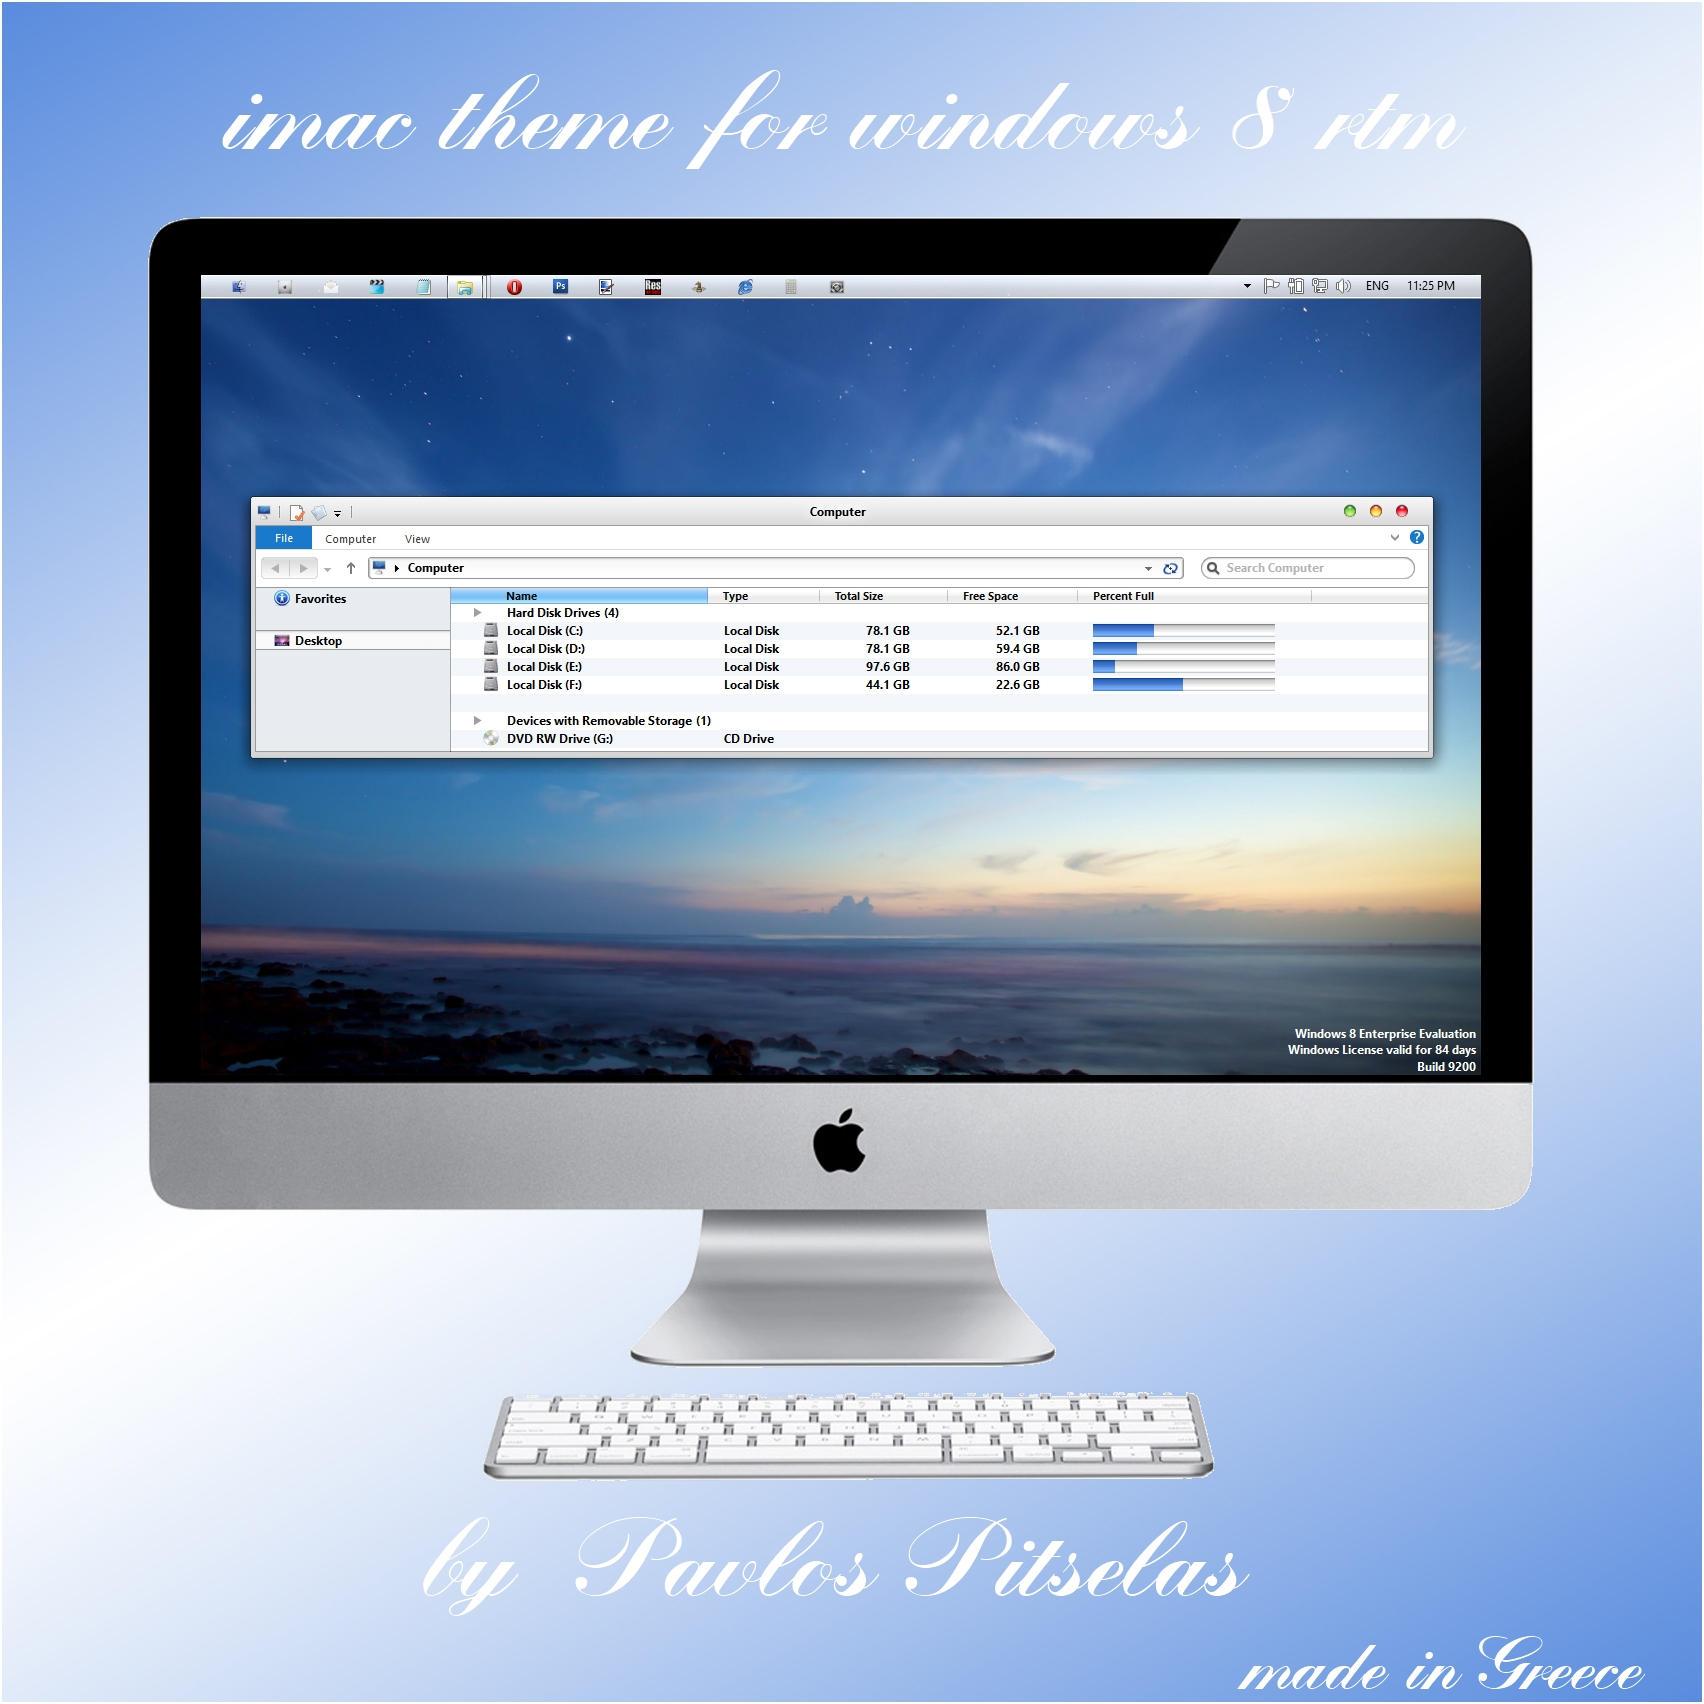 imac_theme_for_windows_8_rtm_32bit_by_zeusosx-d5gbt8p.jpg